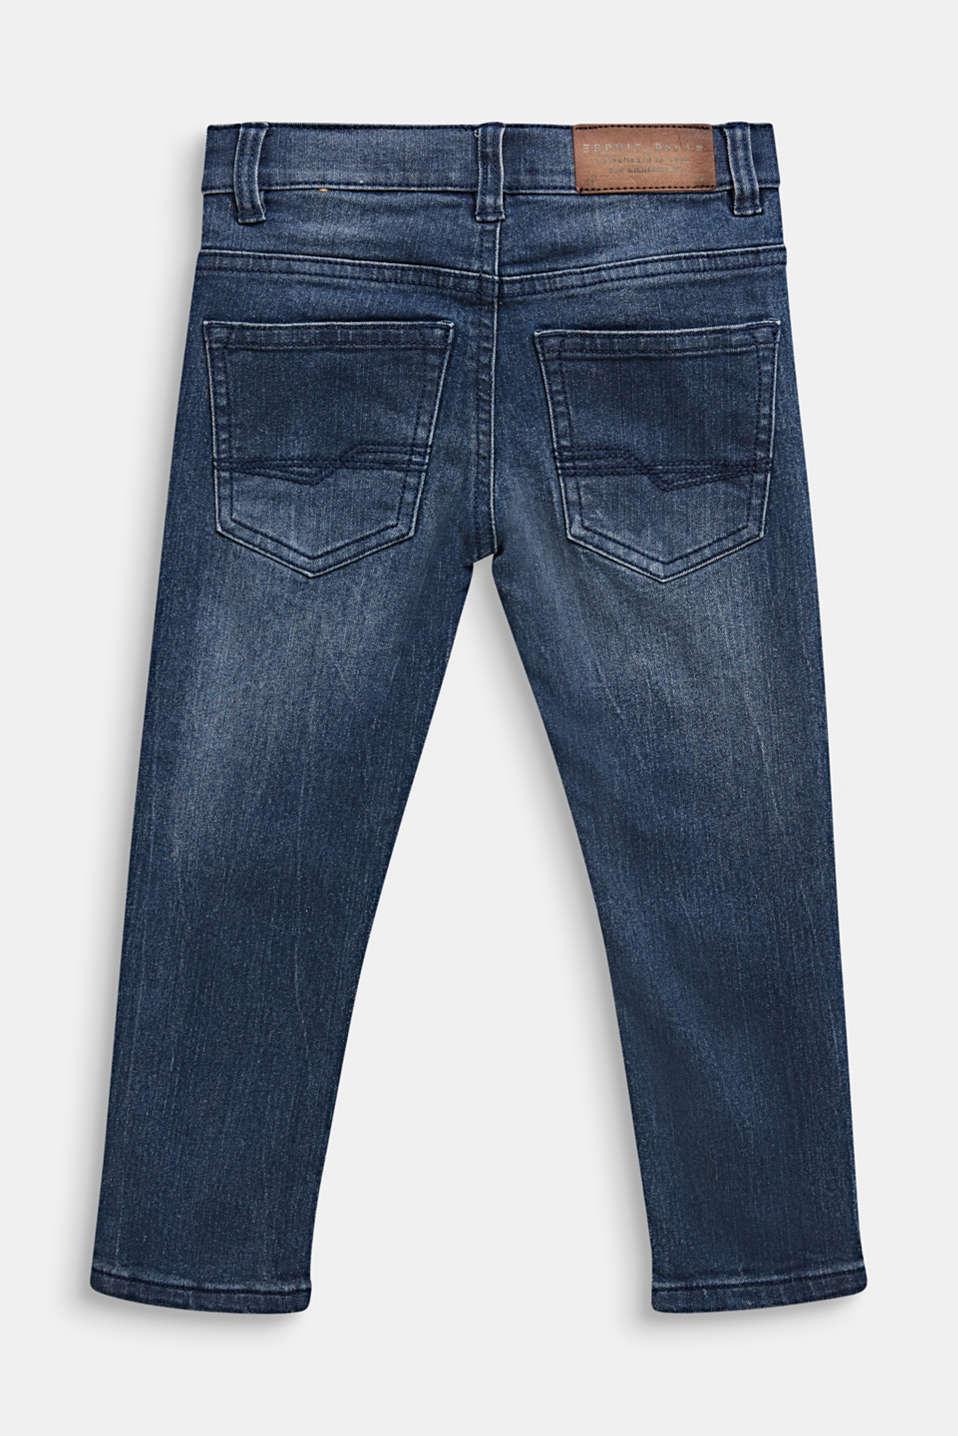 Stretch jeans in a vintage look, LIGHT INDIGO D, detail image number 1